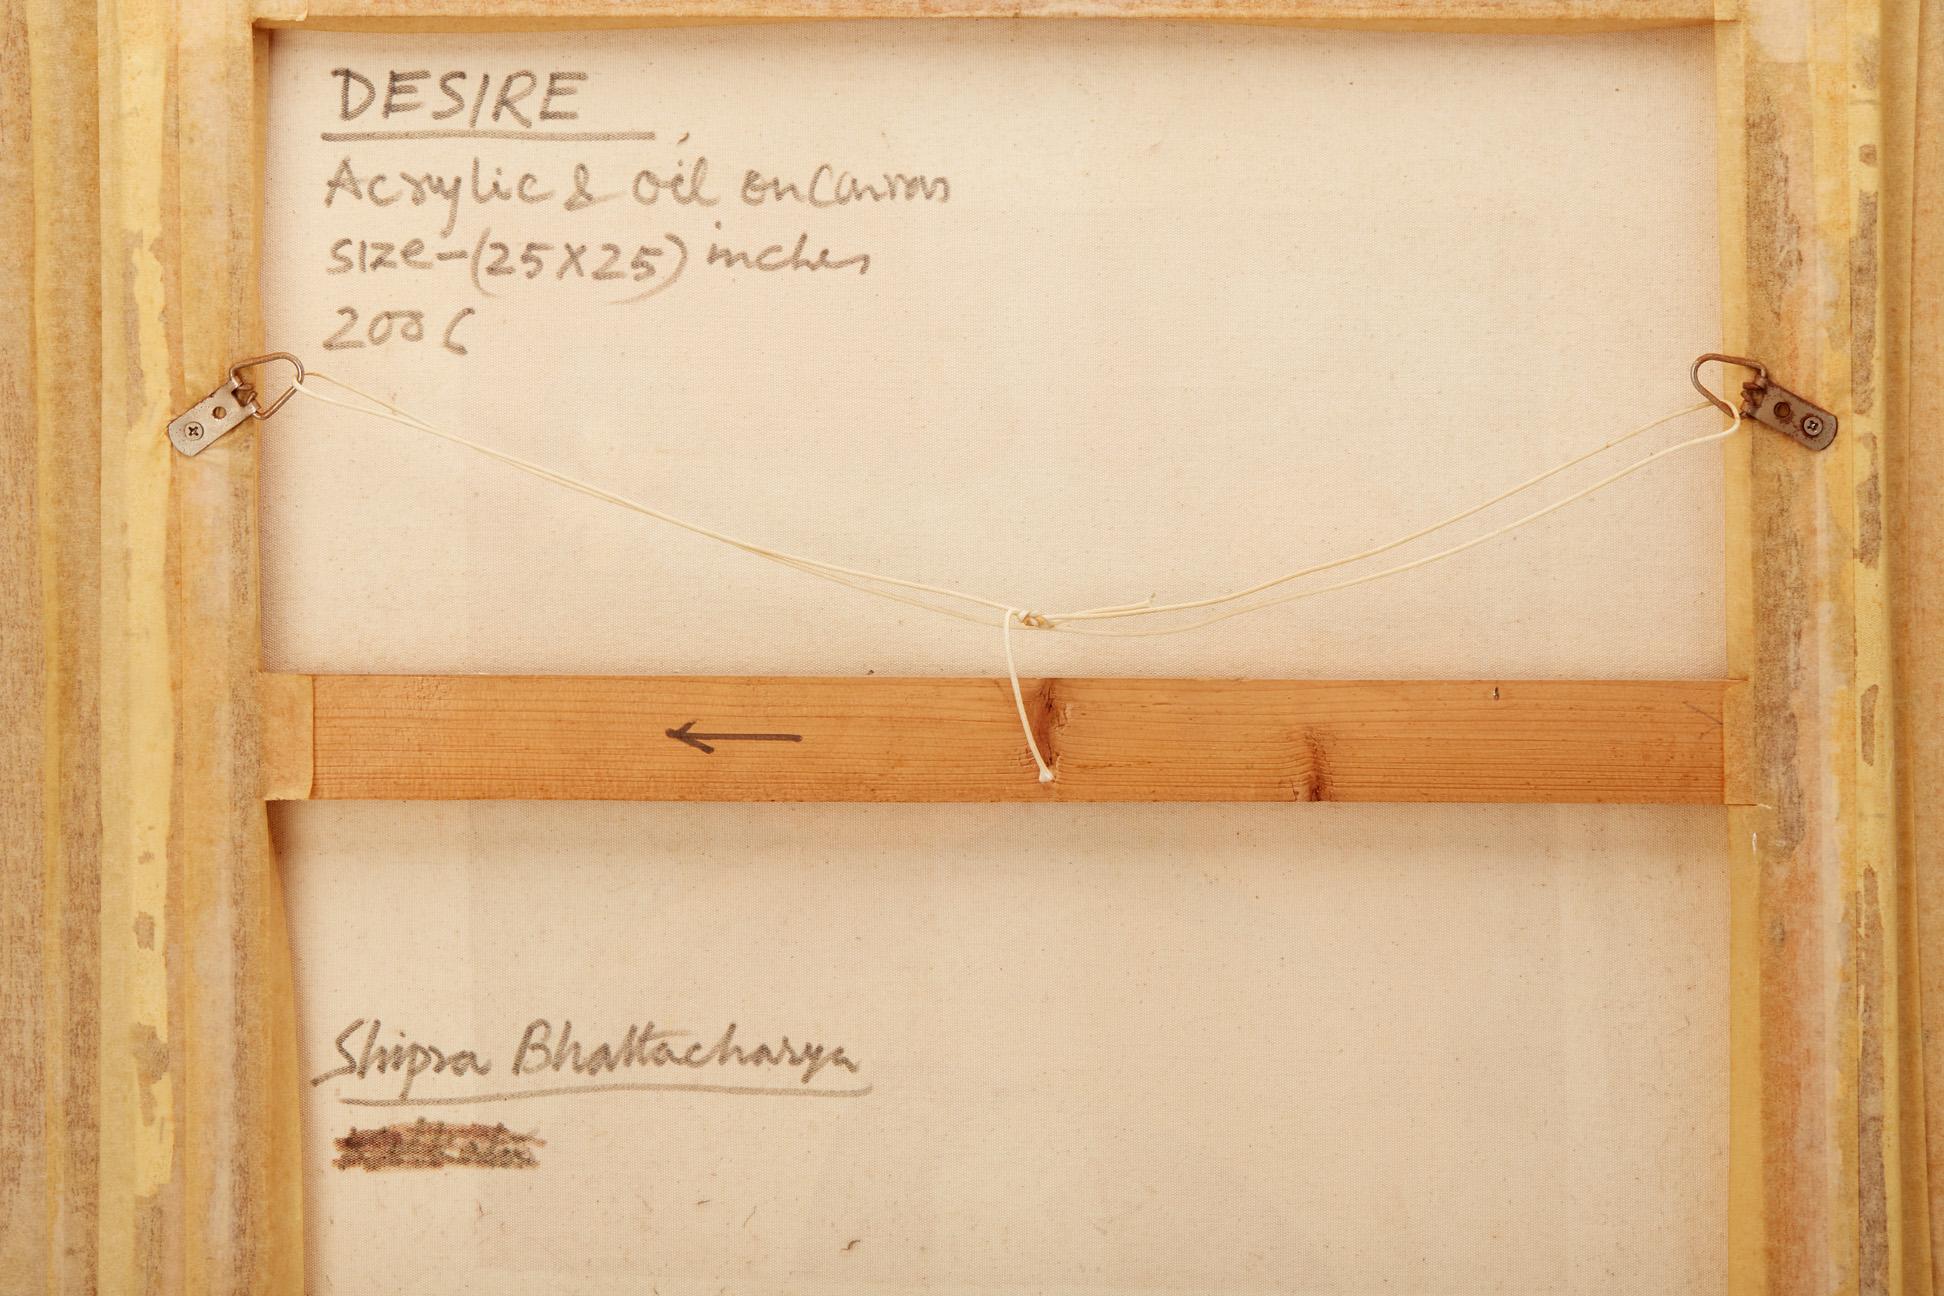 SHIPRA BHATTACHARYA (INDIAN, B.1954) - DESIRE - Image 5 of 5